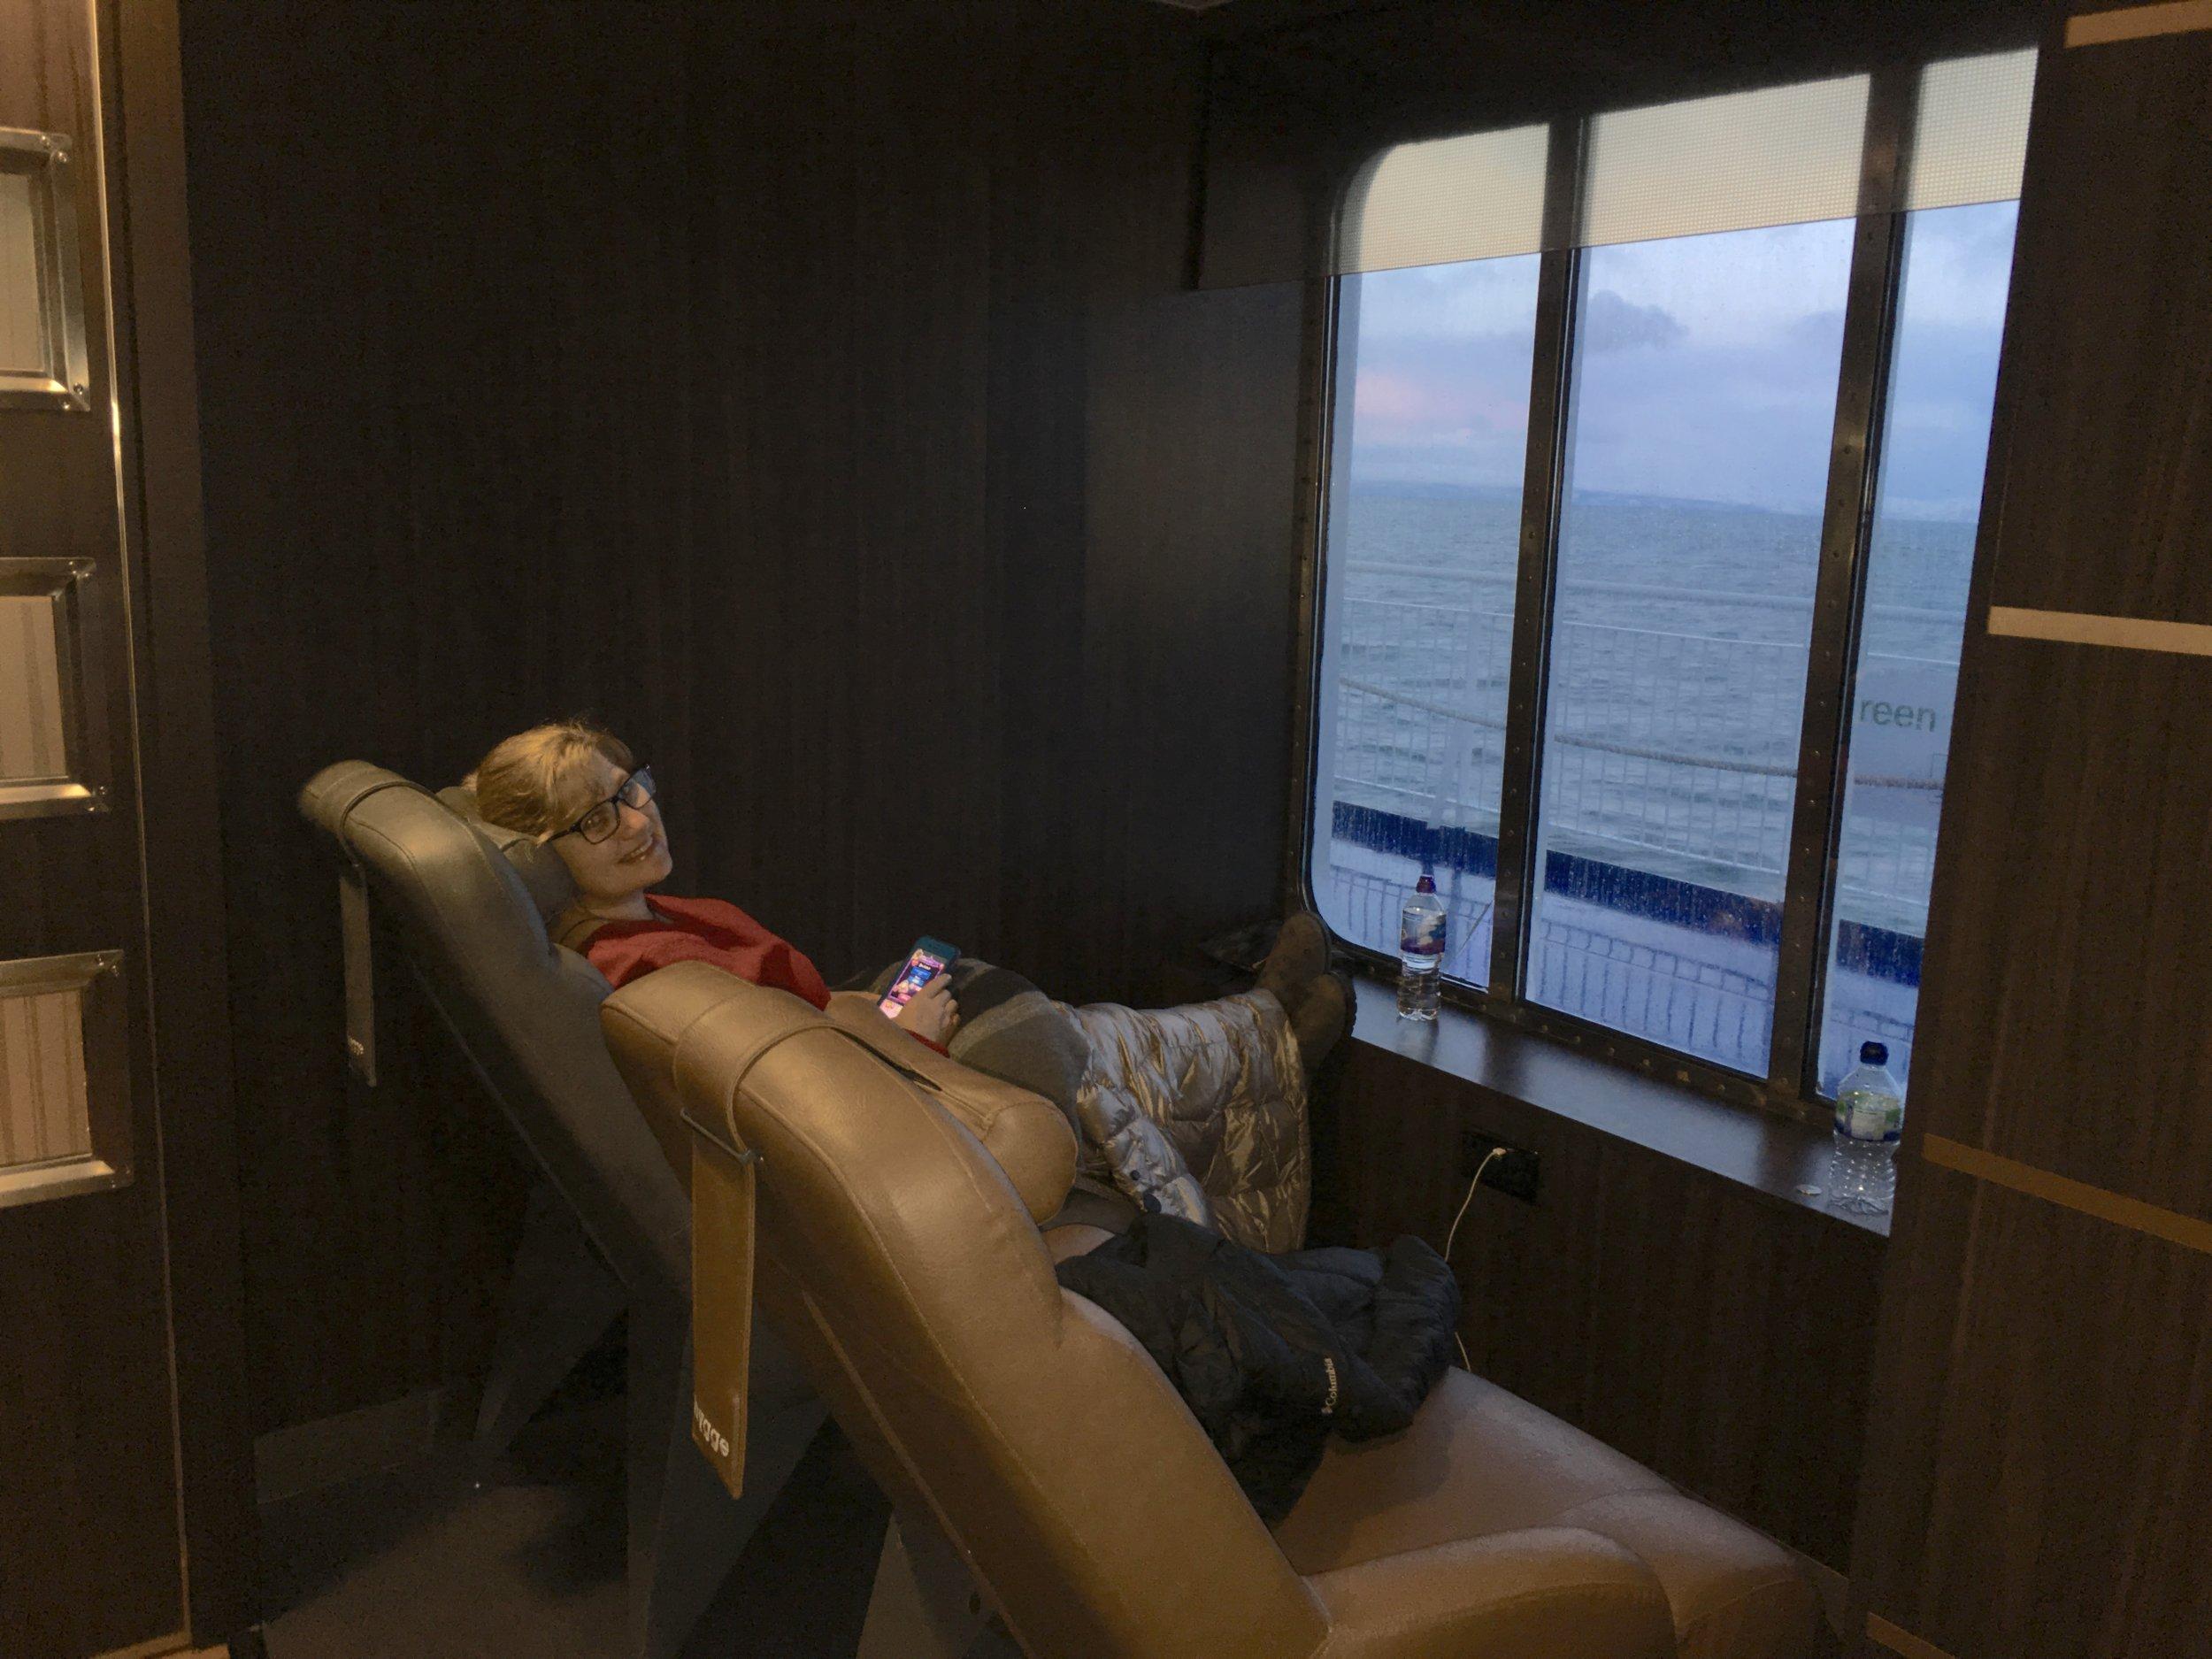 No better way to ferry across the Irish Sea! Cherilyn, AKA Trucker Joe.